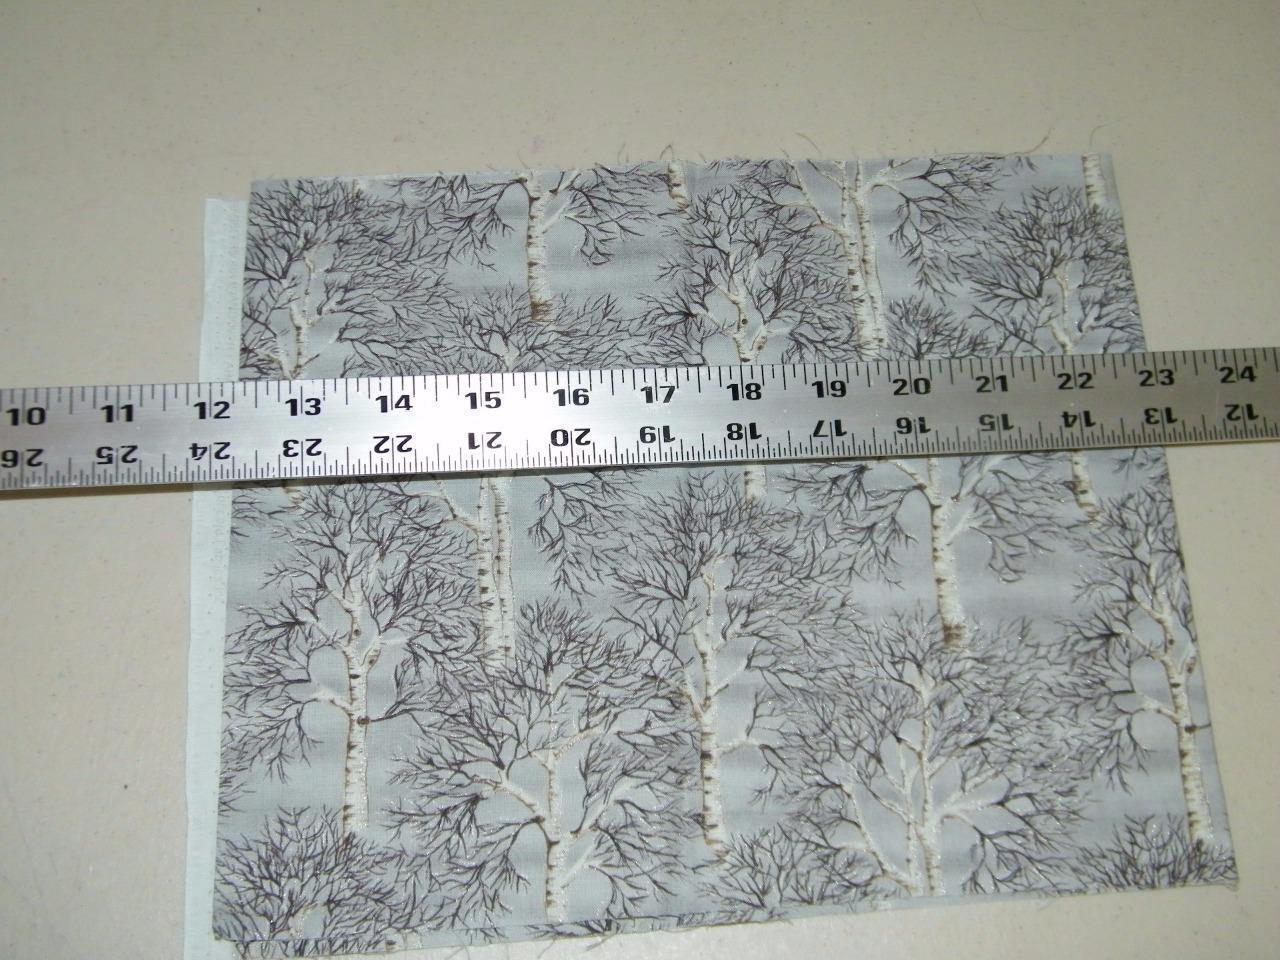 Gail Kessler Andover Fabrics Winter Trees Metallic Quilting Fabric 1/4 Yd 13900